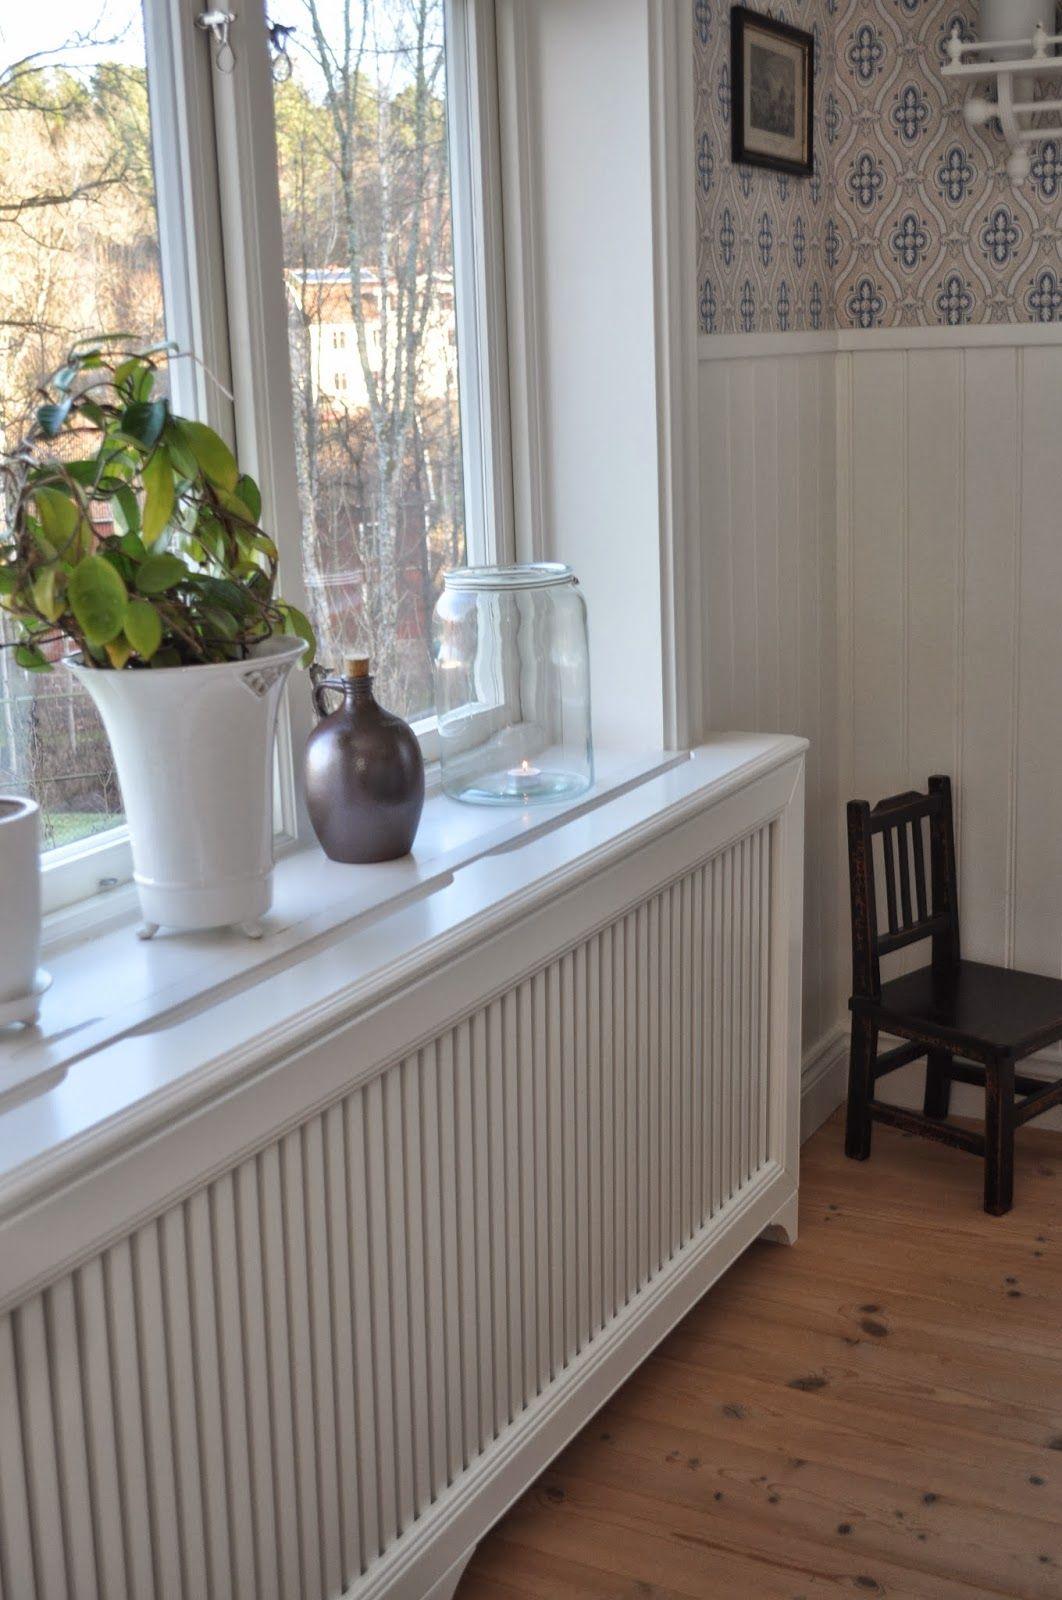 Inredning cover up tapet : elementskydd gammal stil - Sök på Google | Sovrum | Pinterest ...